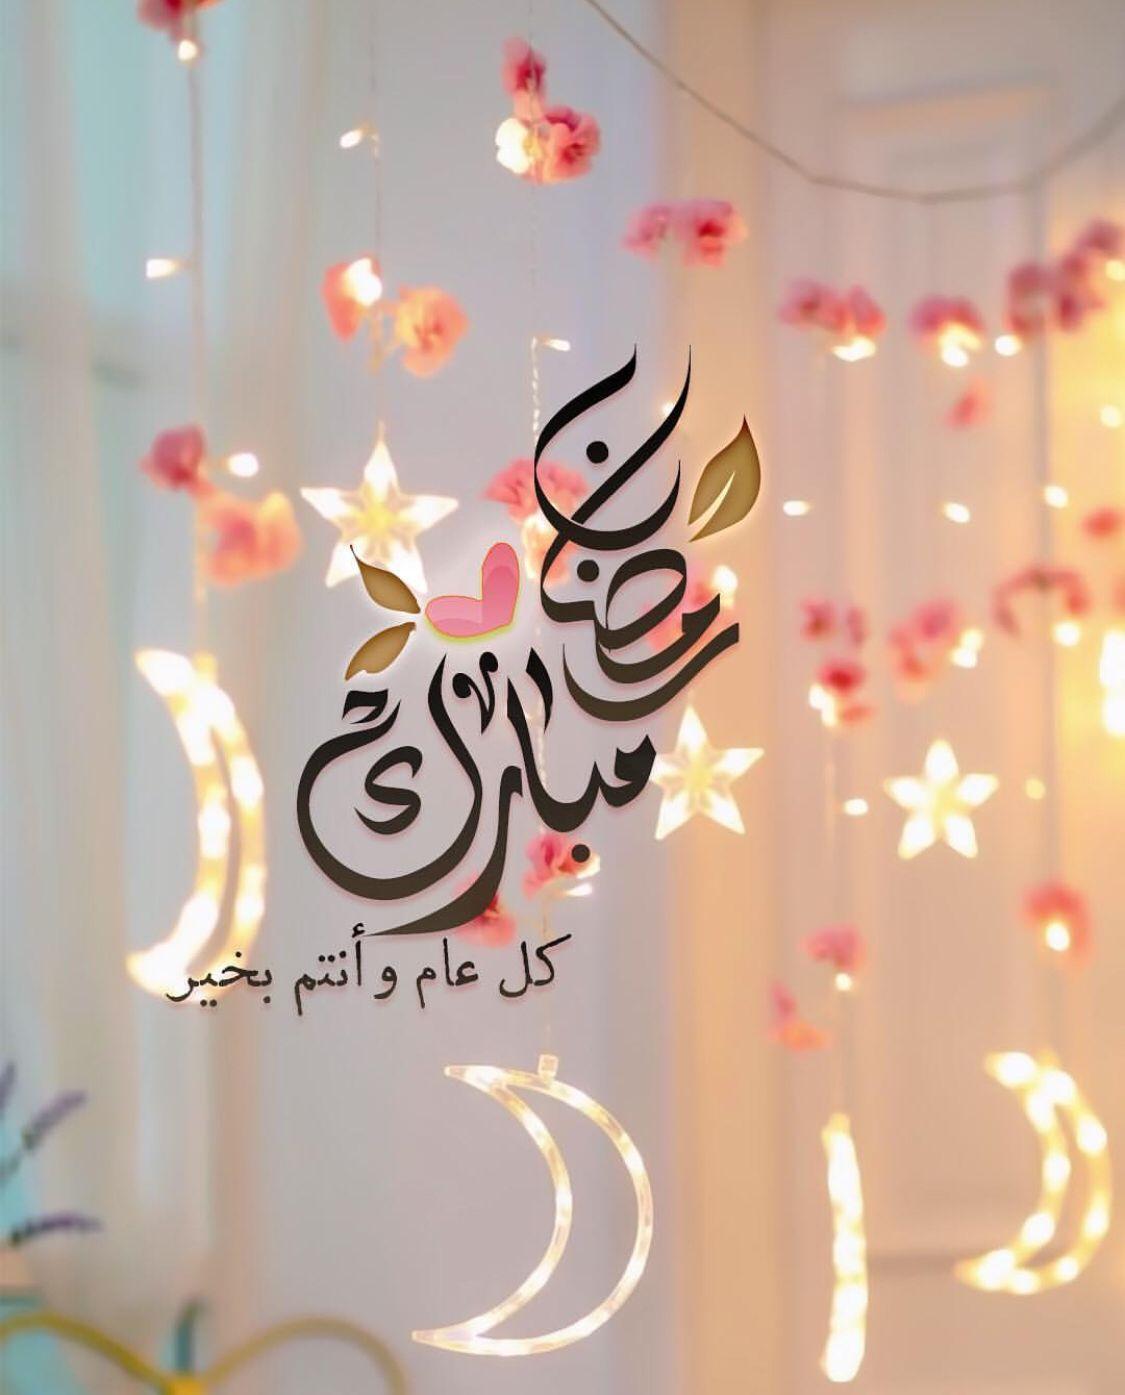 Pin By Nour Hiba On رمضان كريم Ramadan Kareem Ramadan Greetings Ramadan Cards Ramadan Kareem Decoration